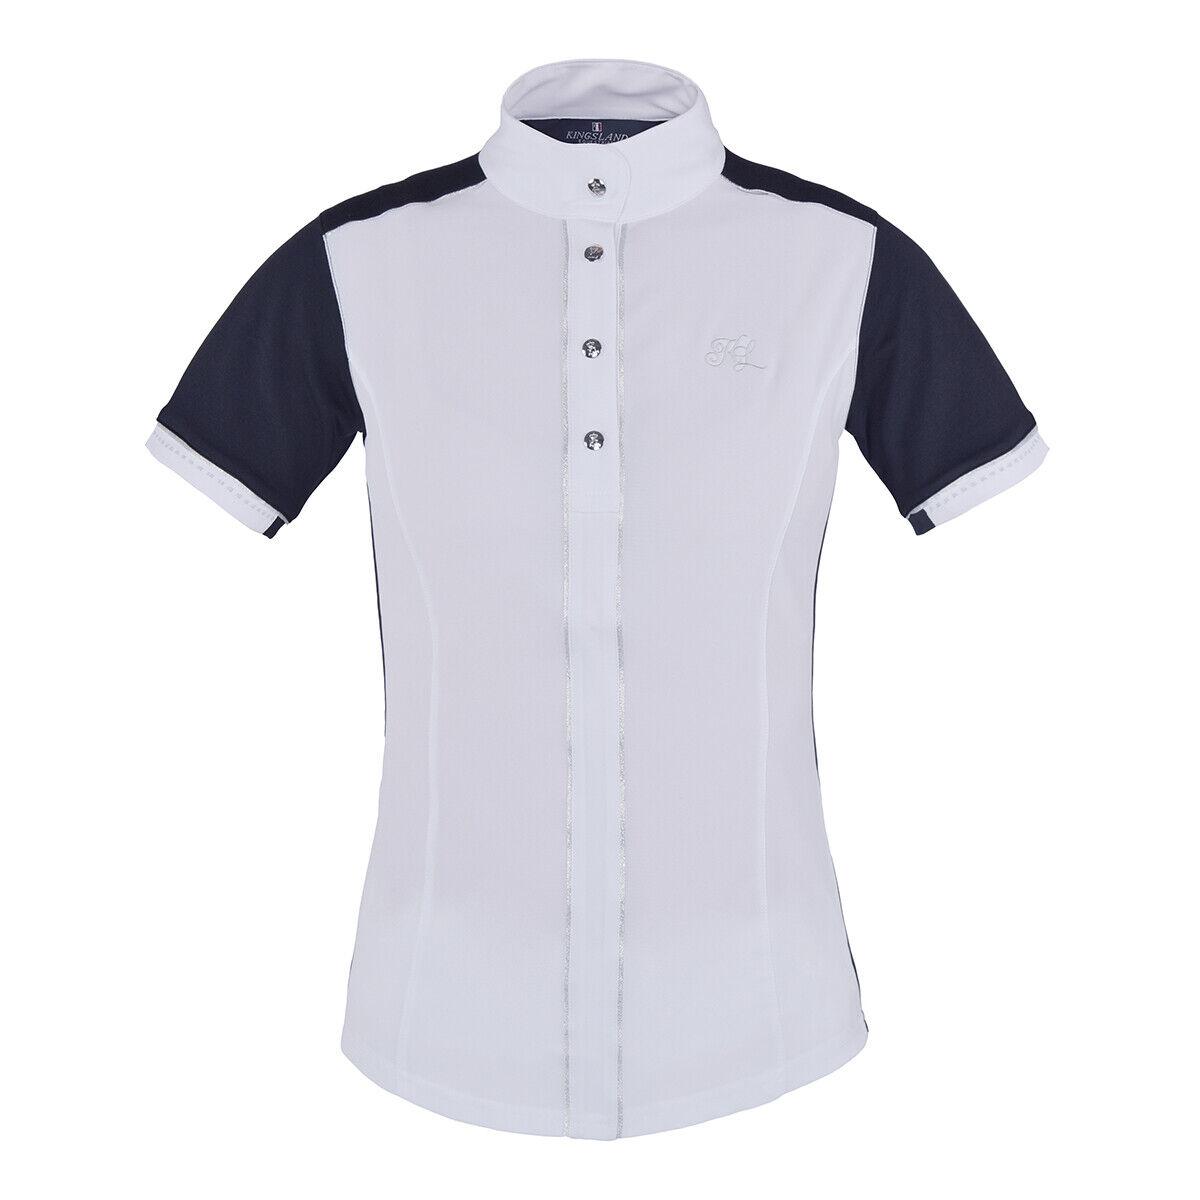 Ladies Kingsland Laurel Short Sleeved Show Shirt - Large - Navy RRP